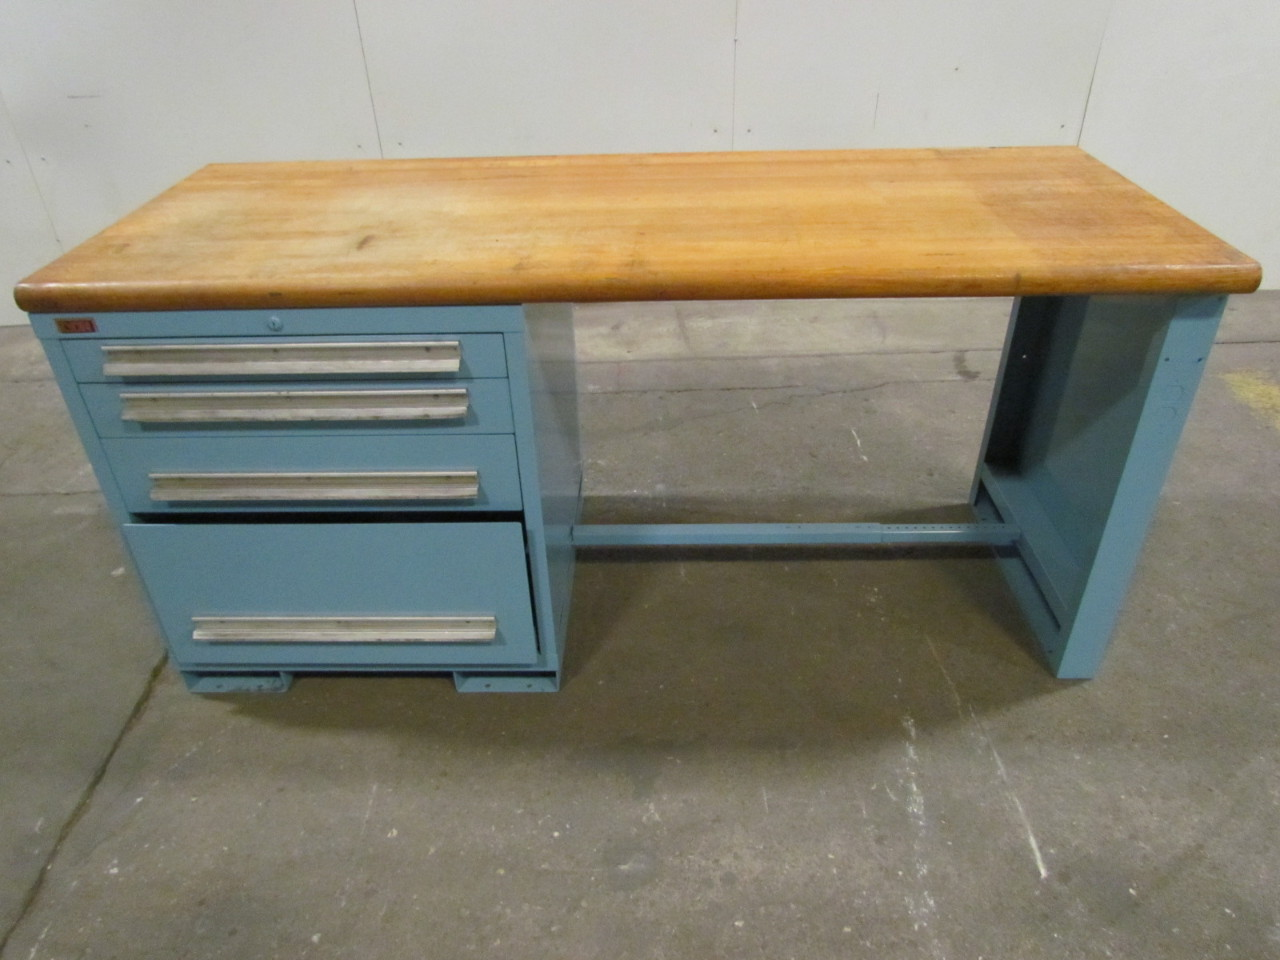 lyon industrial butcher block work bench 72 quot wx28 1 4 quot dx34